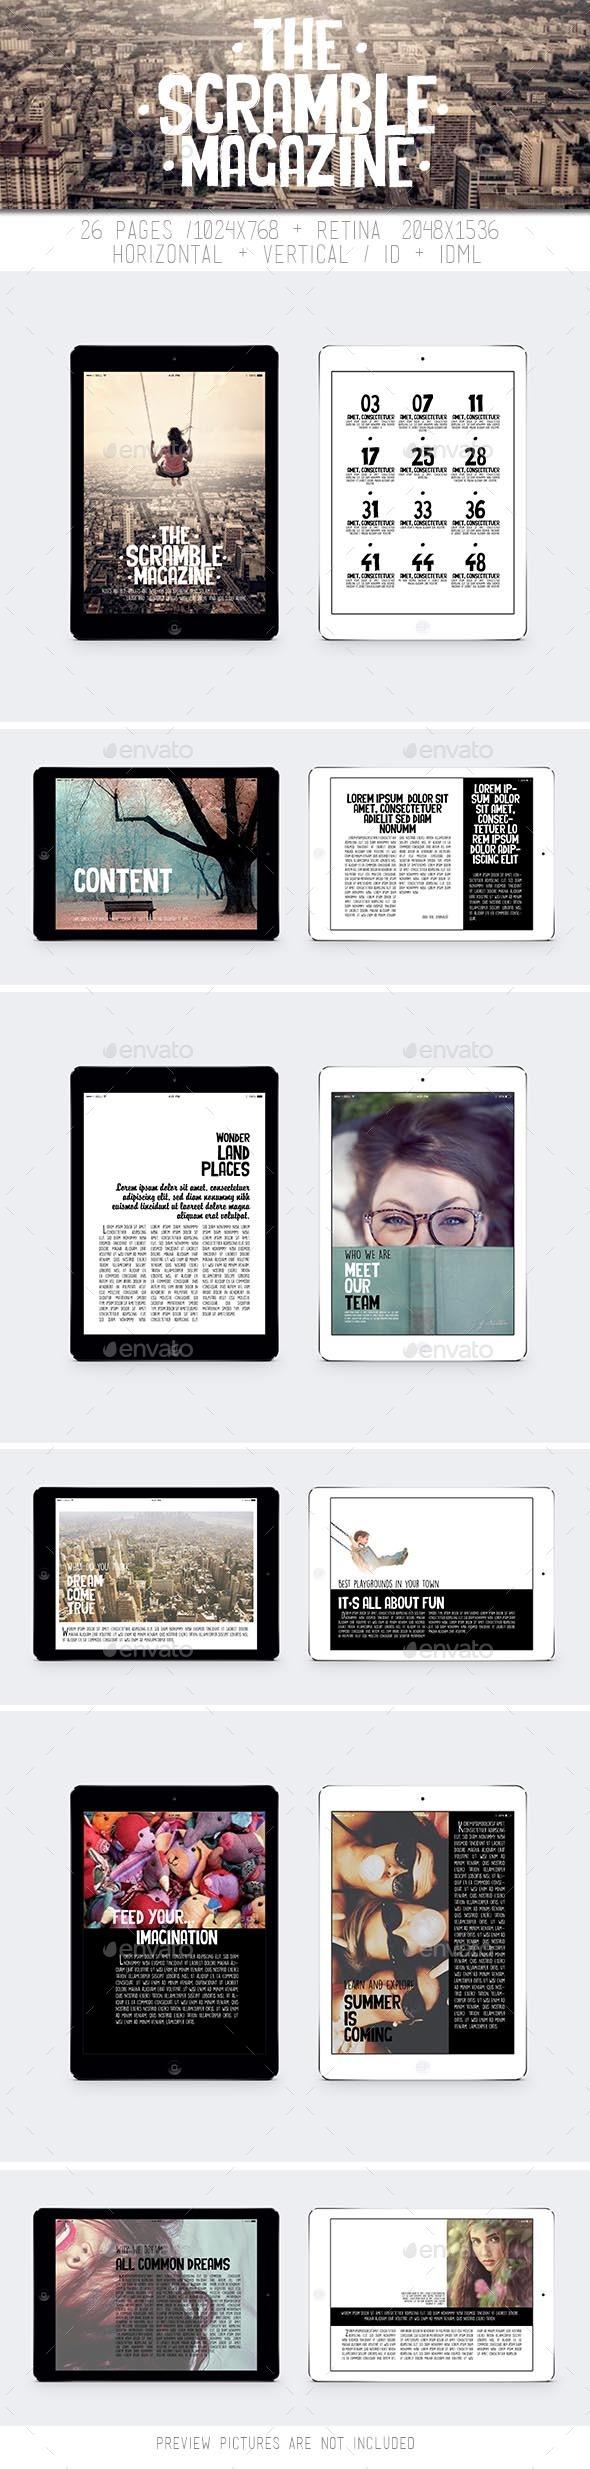 Tablet The Scramble Magazine